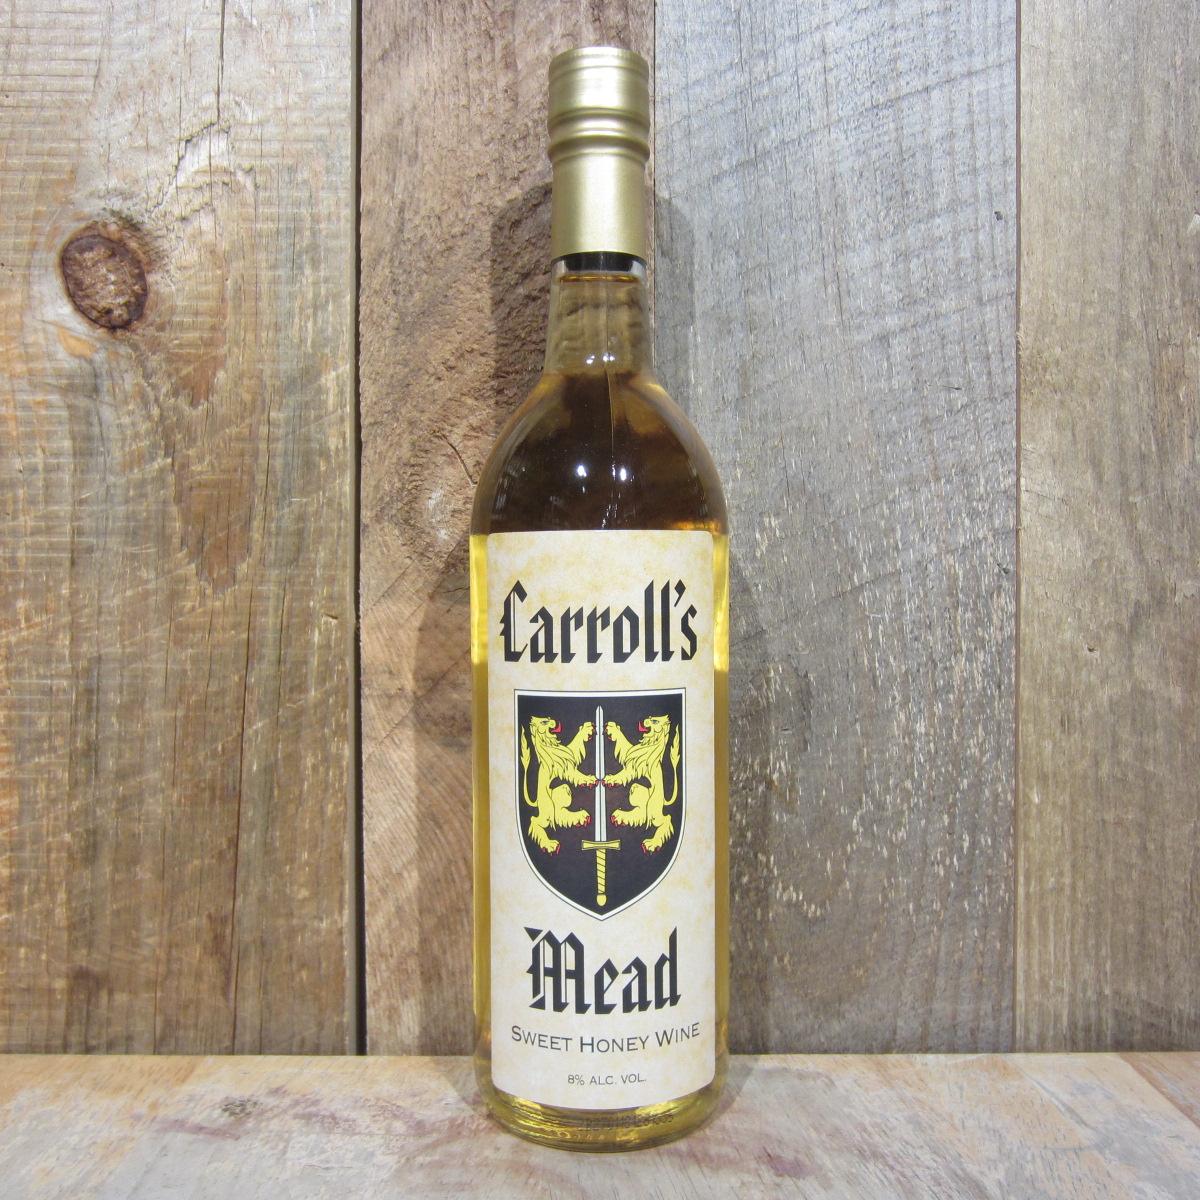 Brotherhood Carrolls Mead Honey 750ml